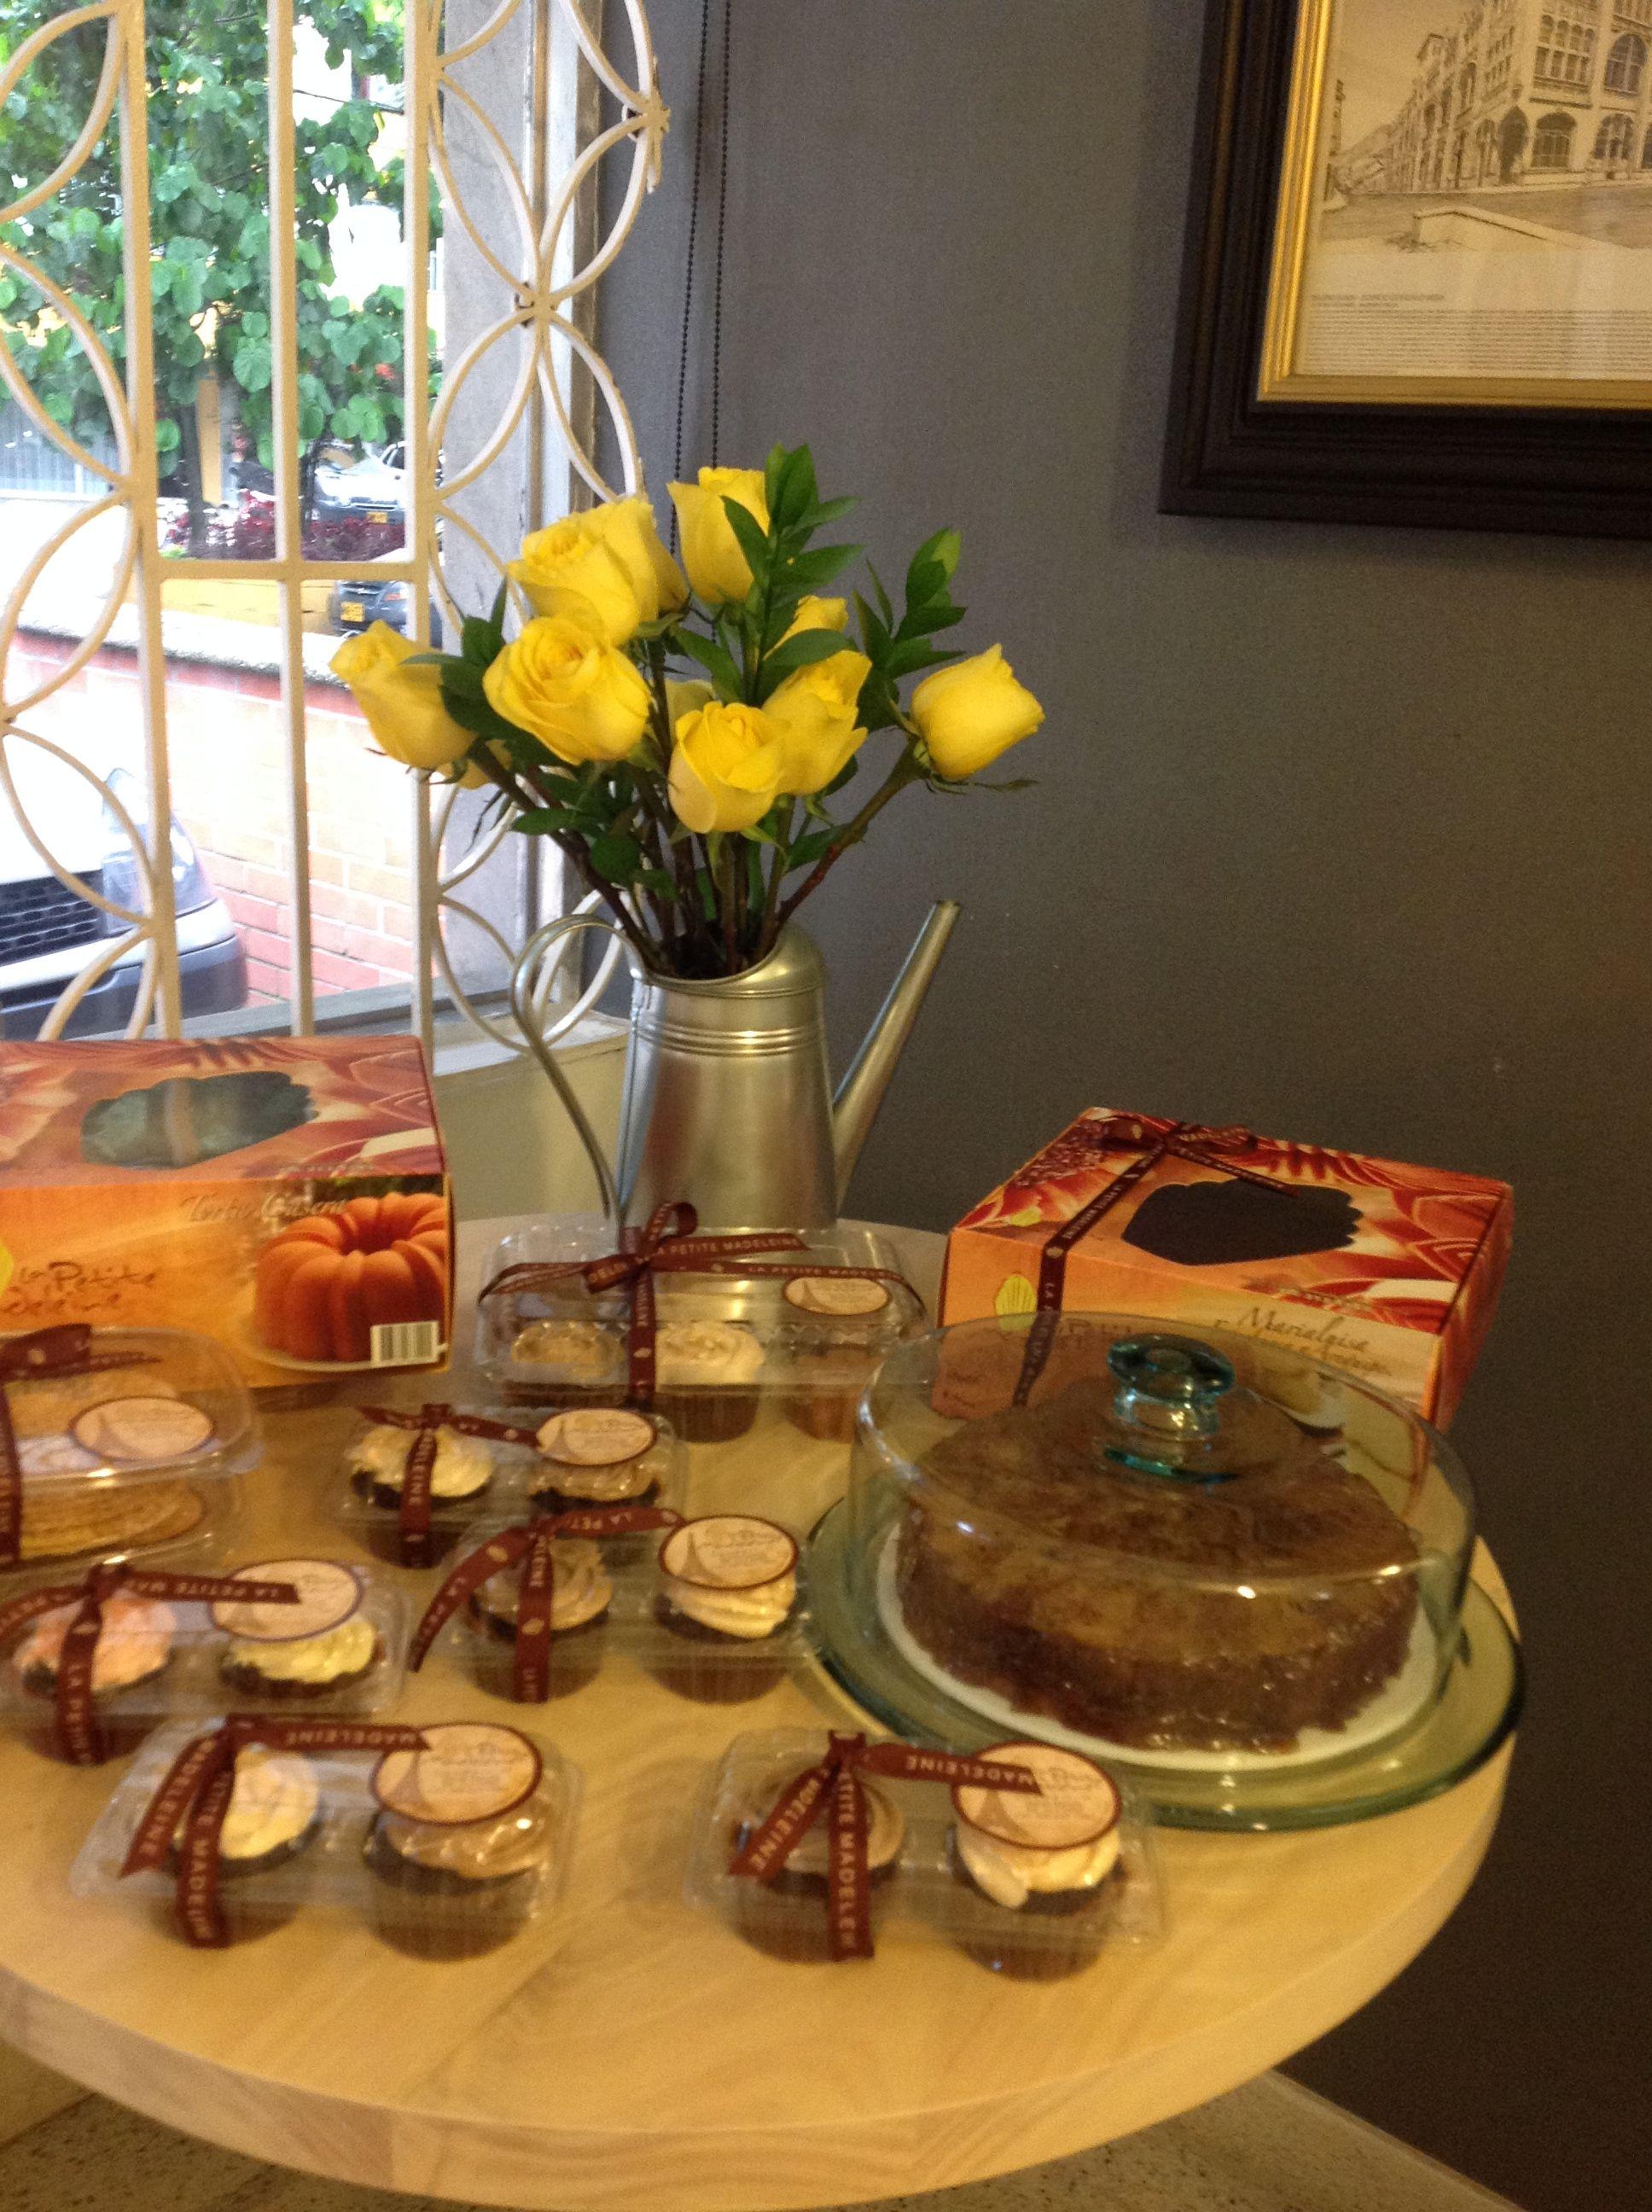 Las rosas amarilas para decorar la reposteria Yellow roses for decorating our bakery